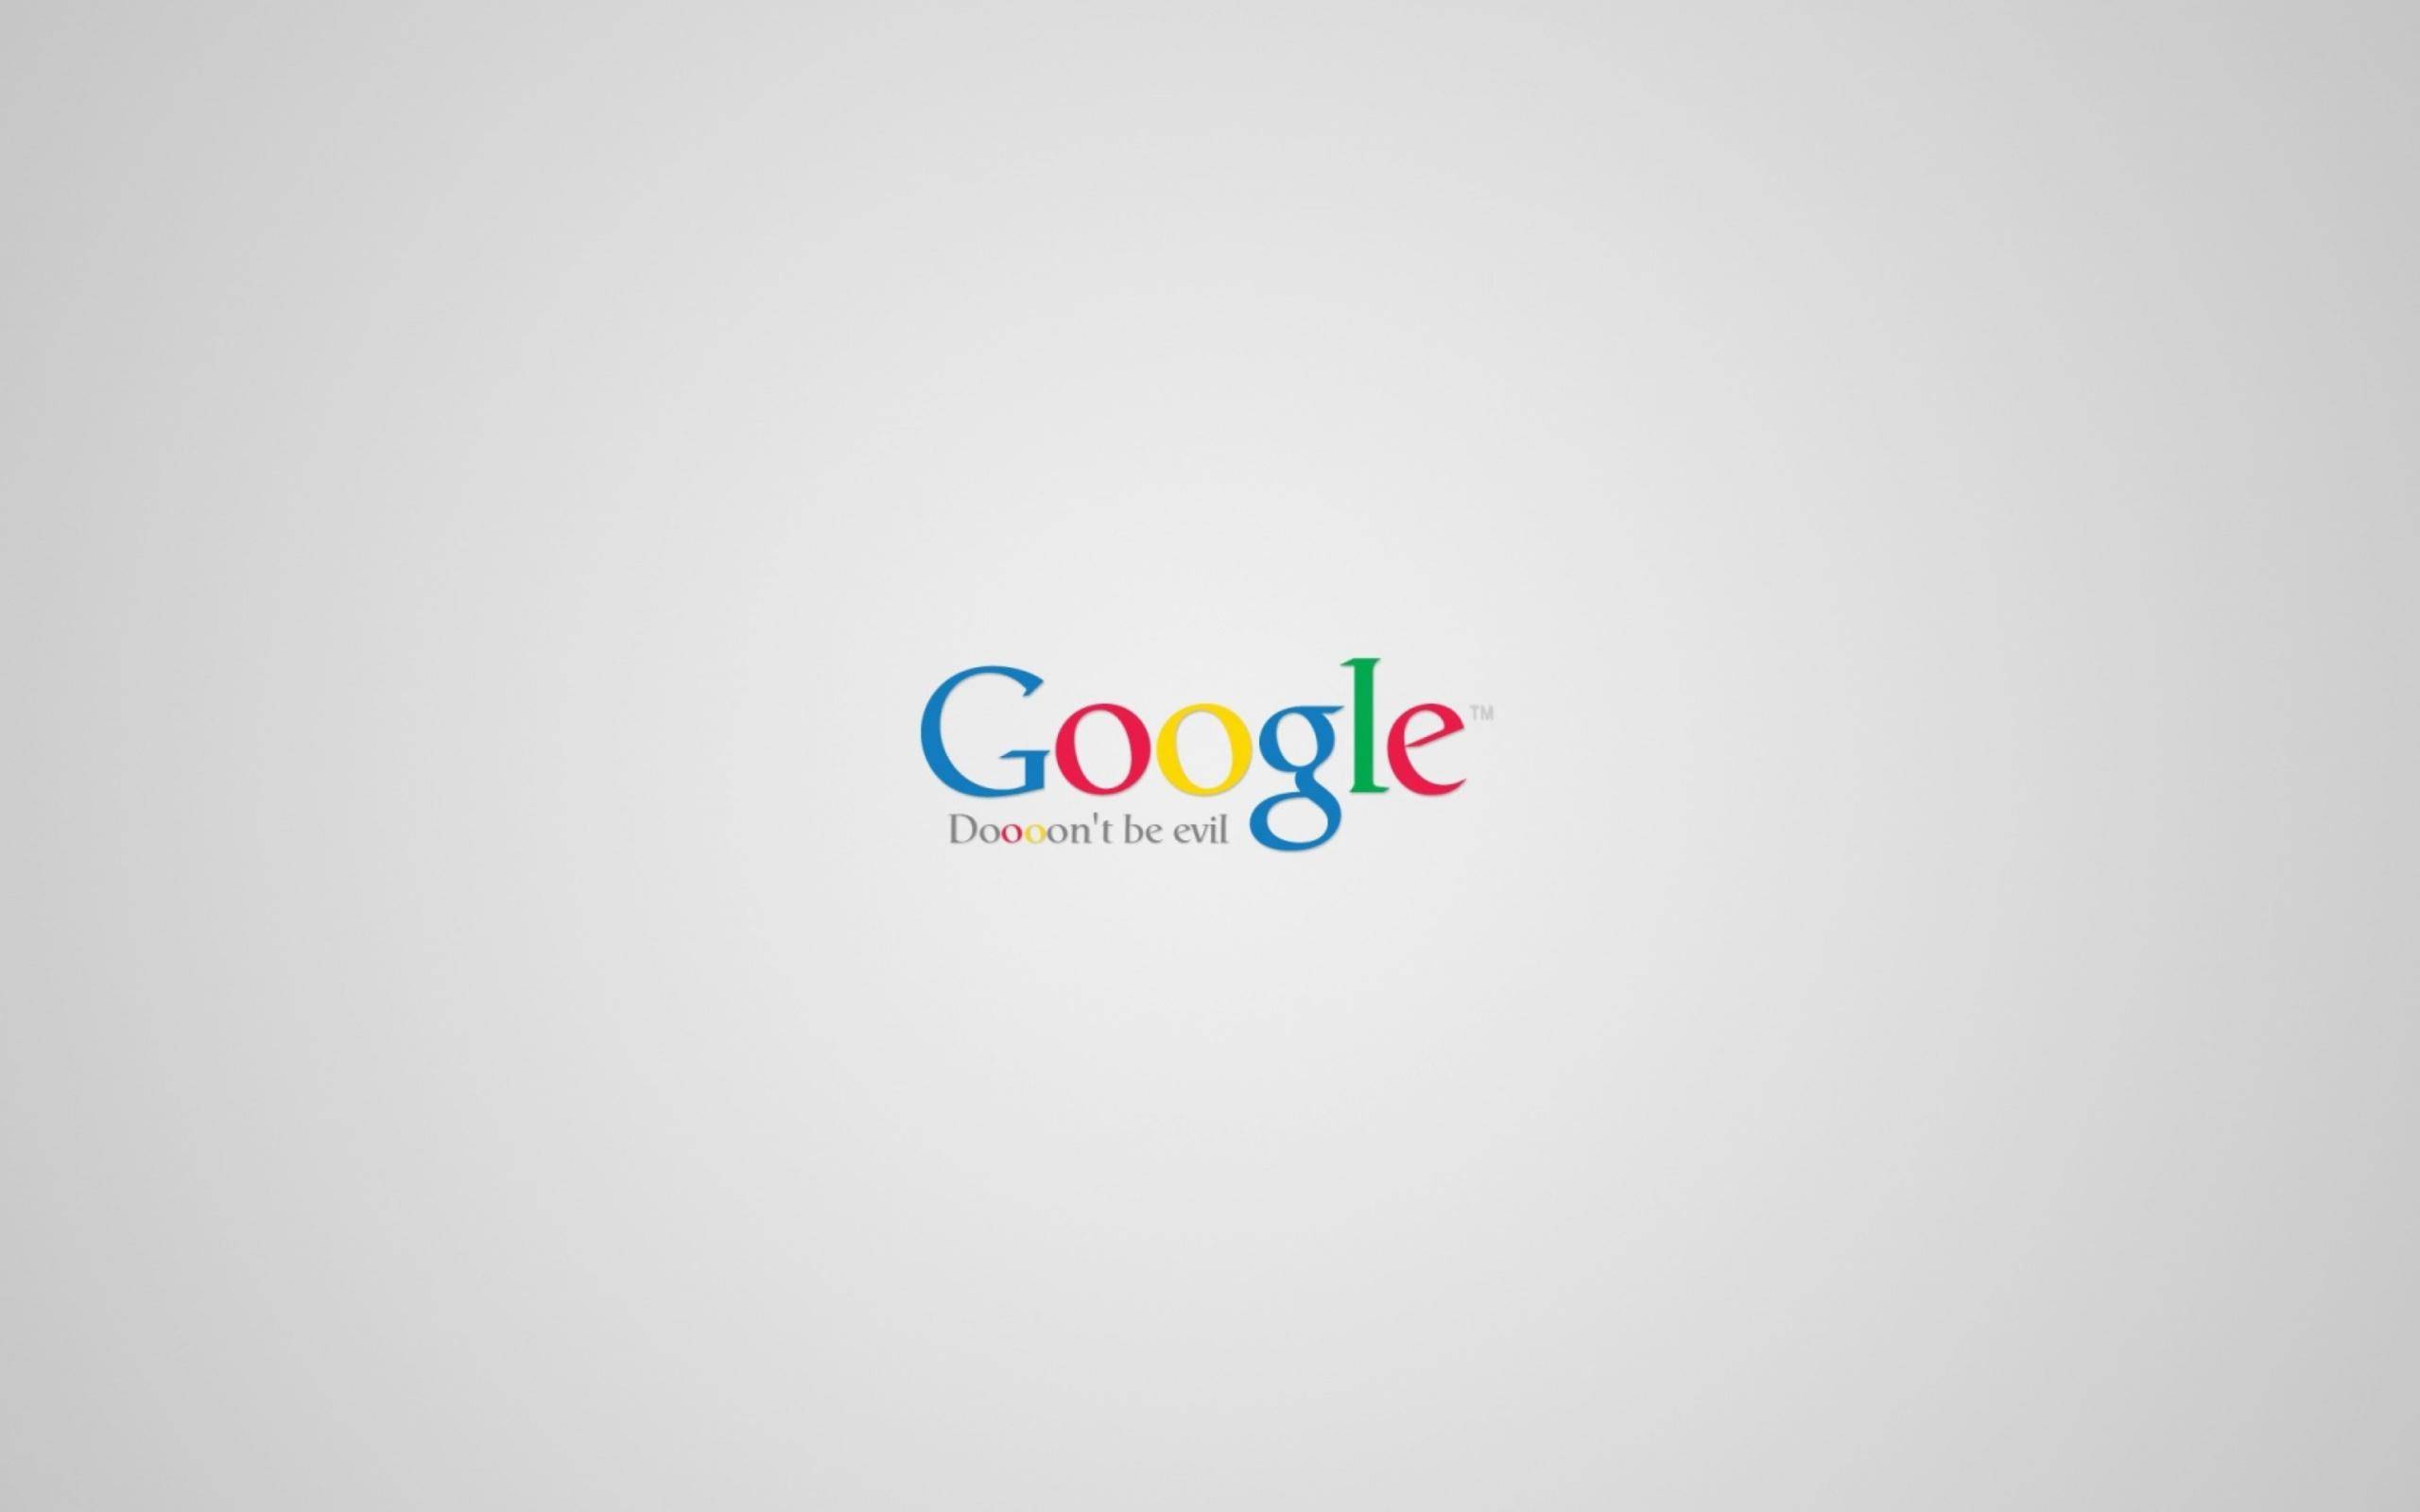 Условия использования Google Play без смс